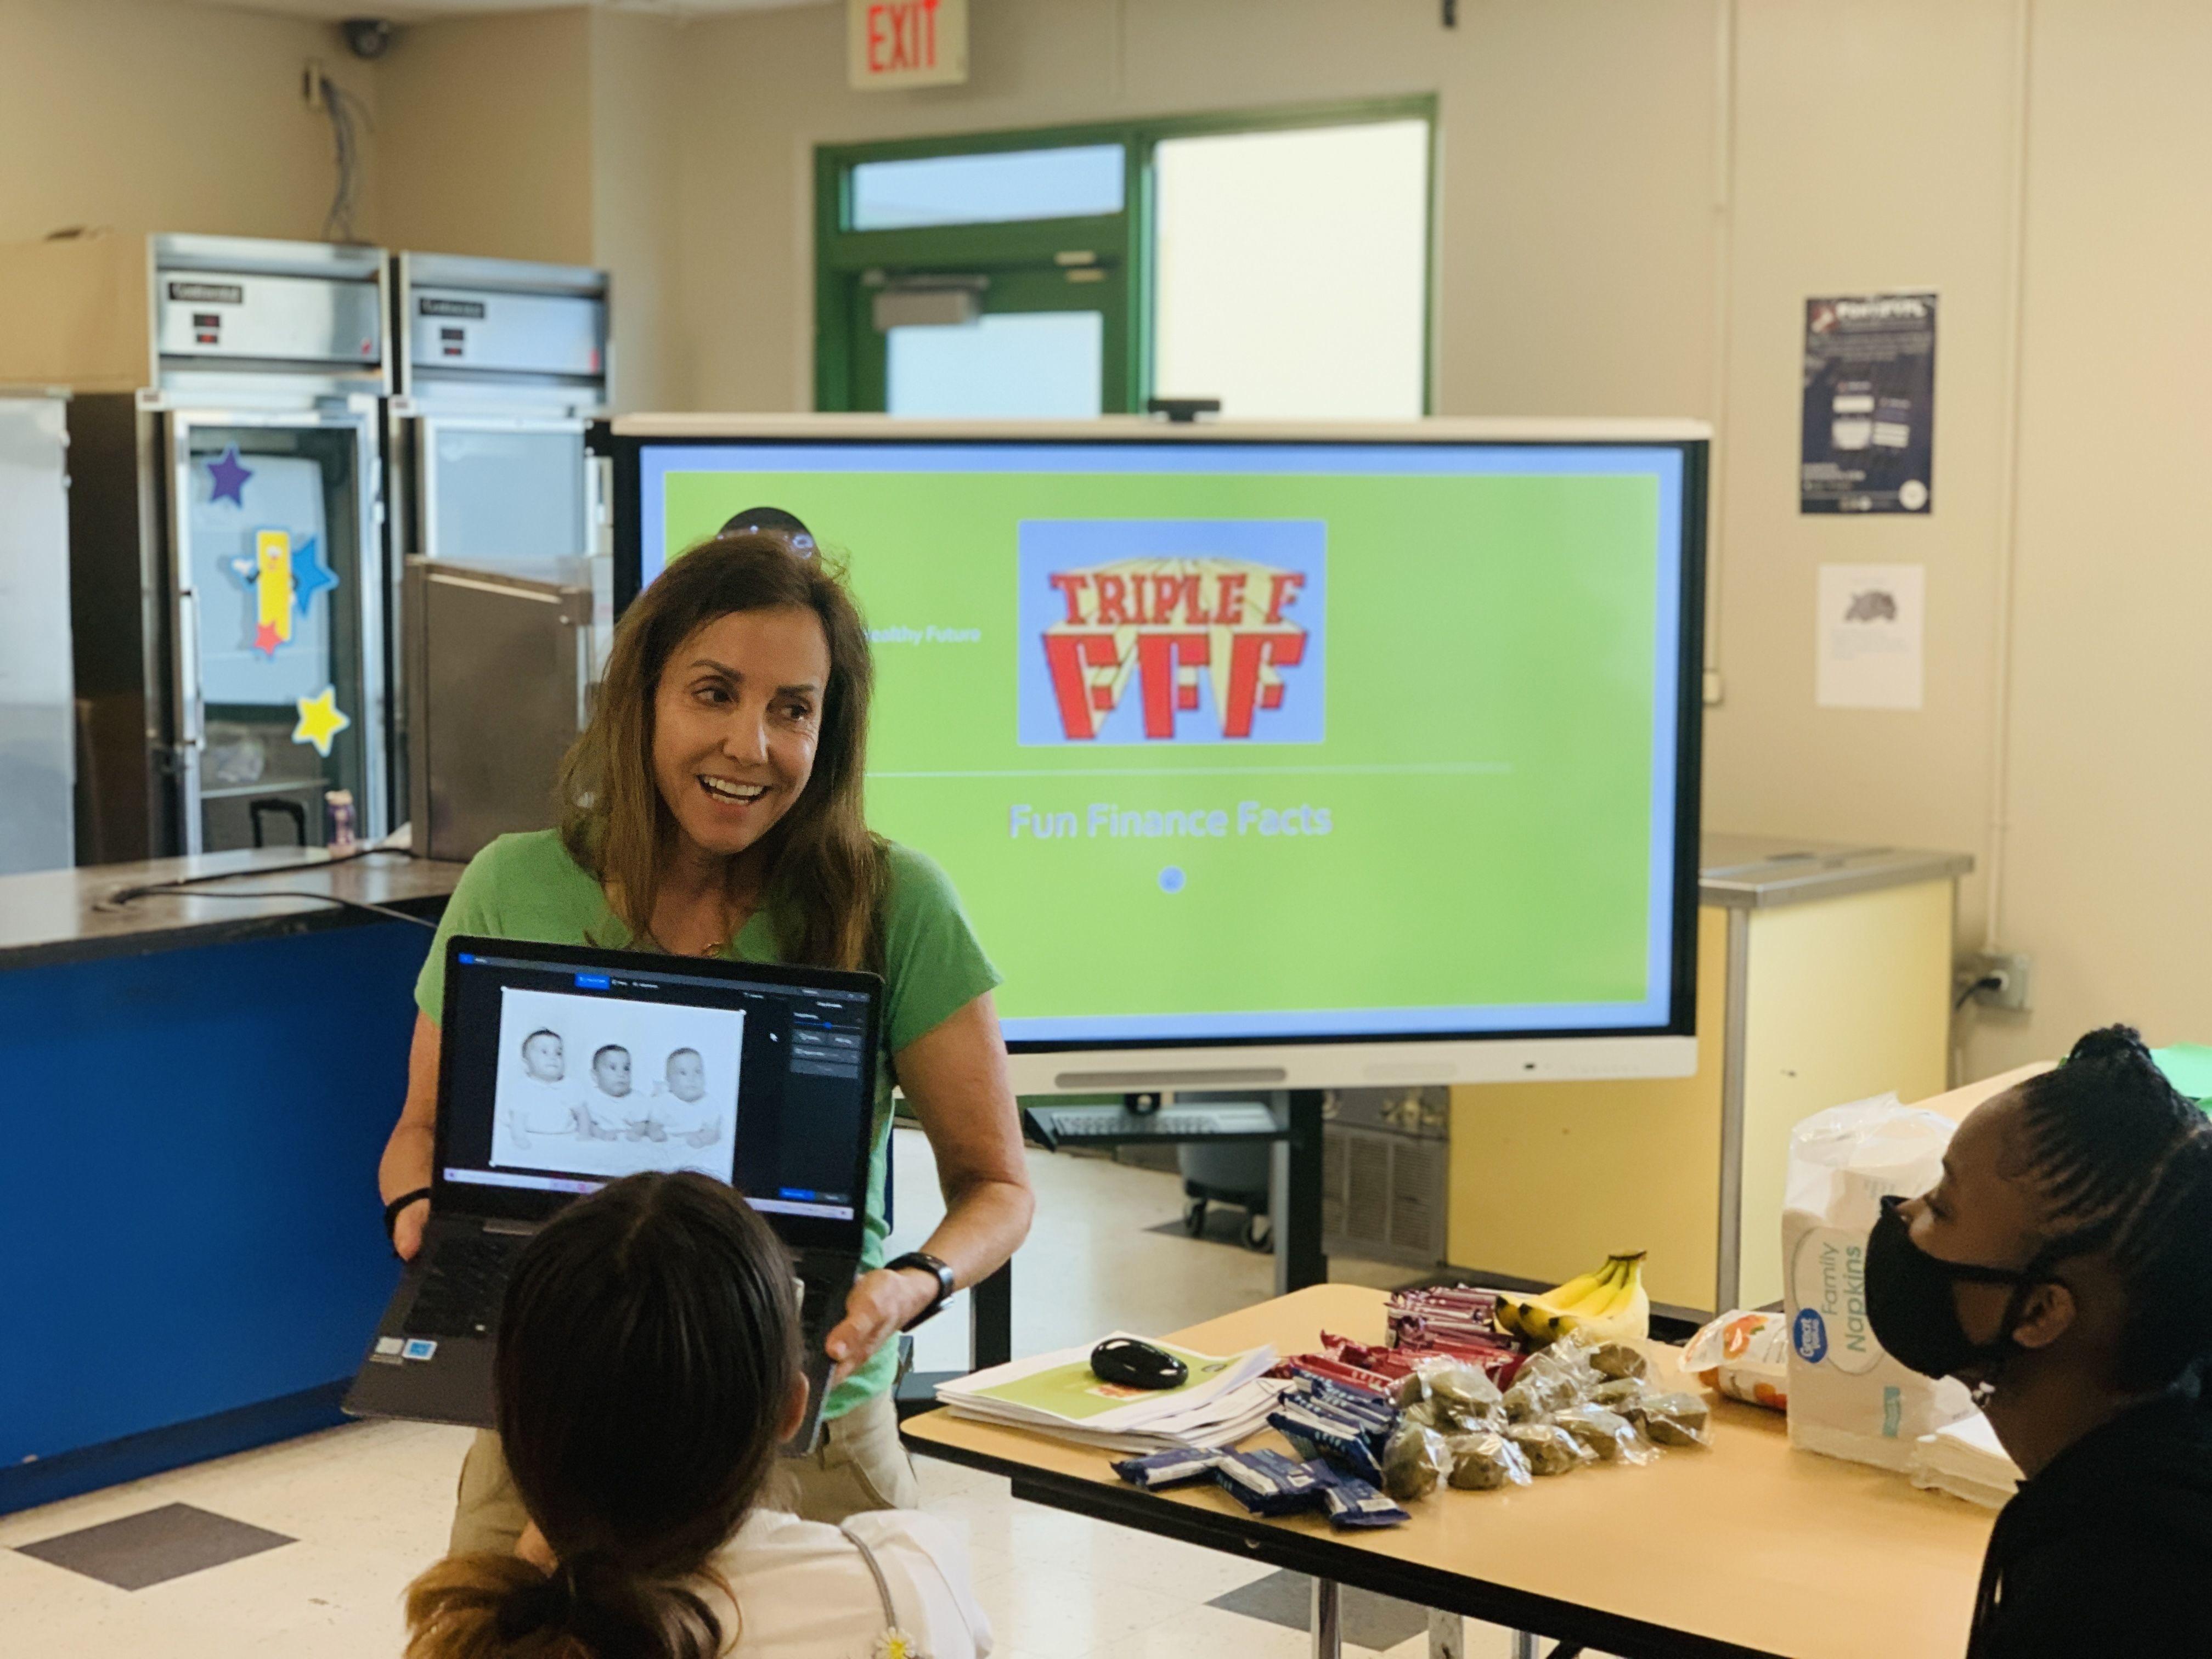 Volunteering to increase financial literacy.